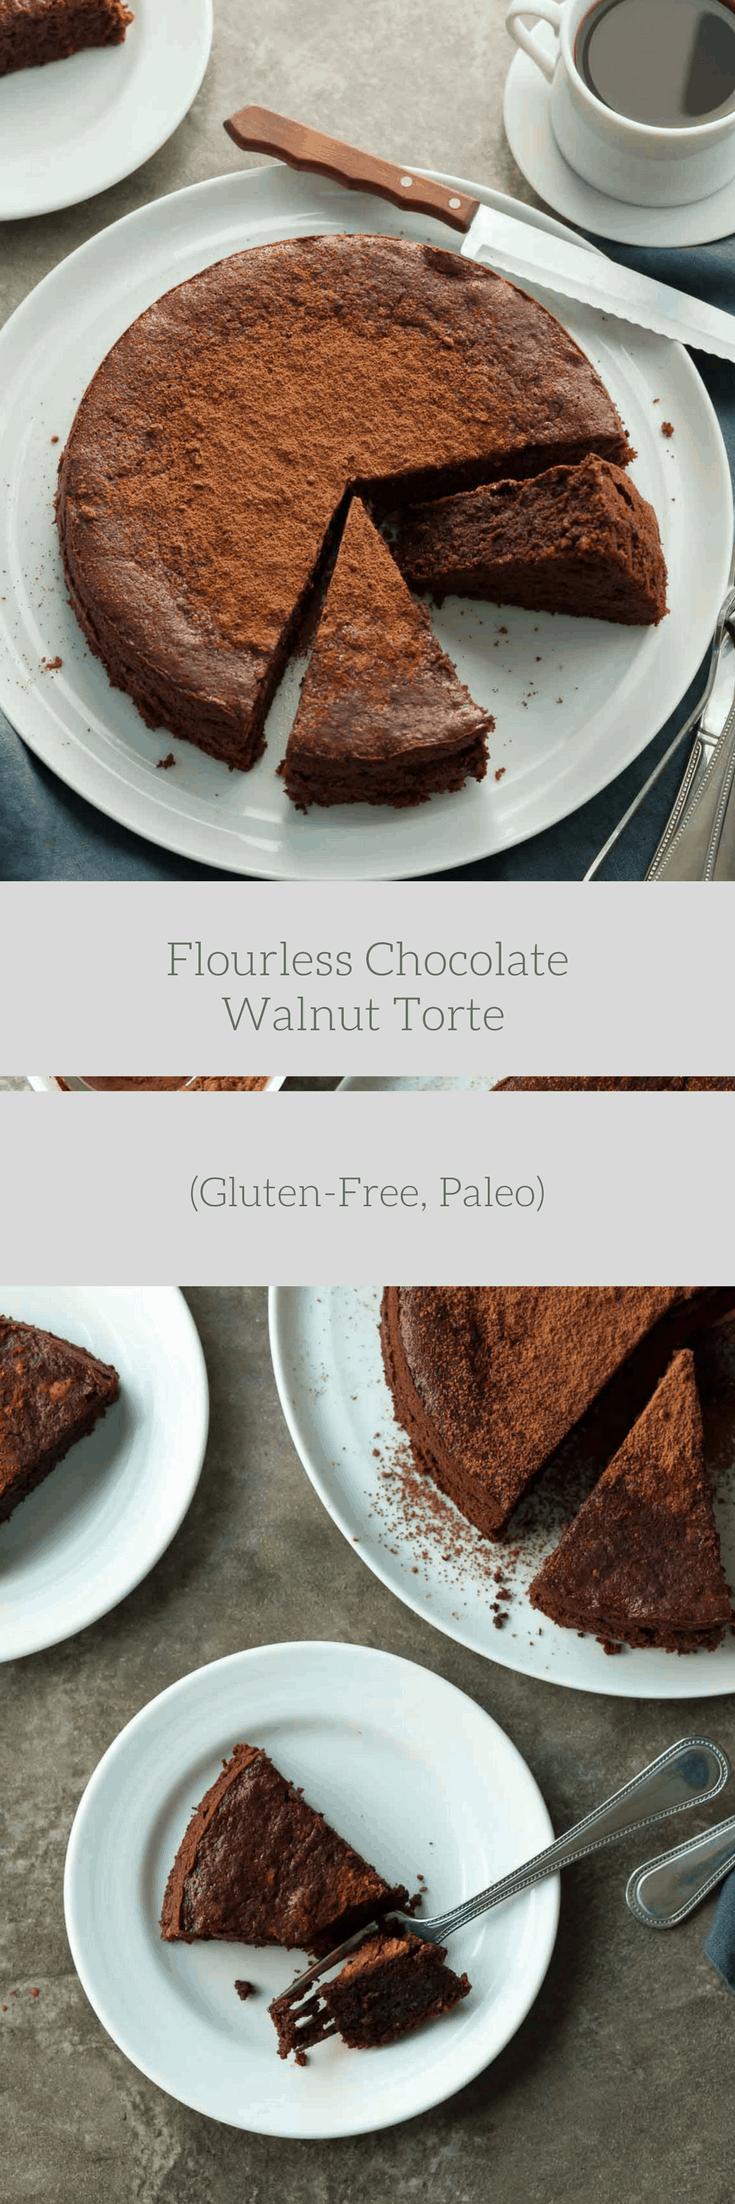 Flourless Chocolate Walnut Cake Recipe